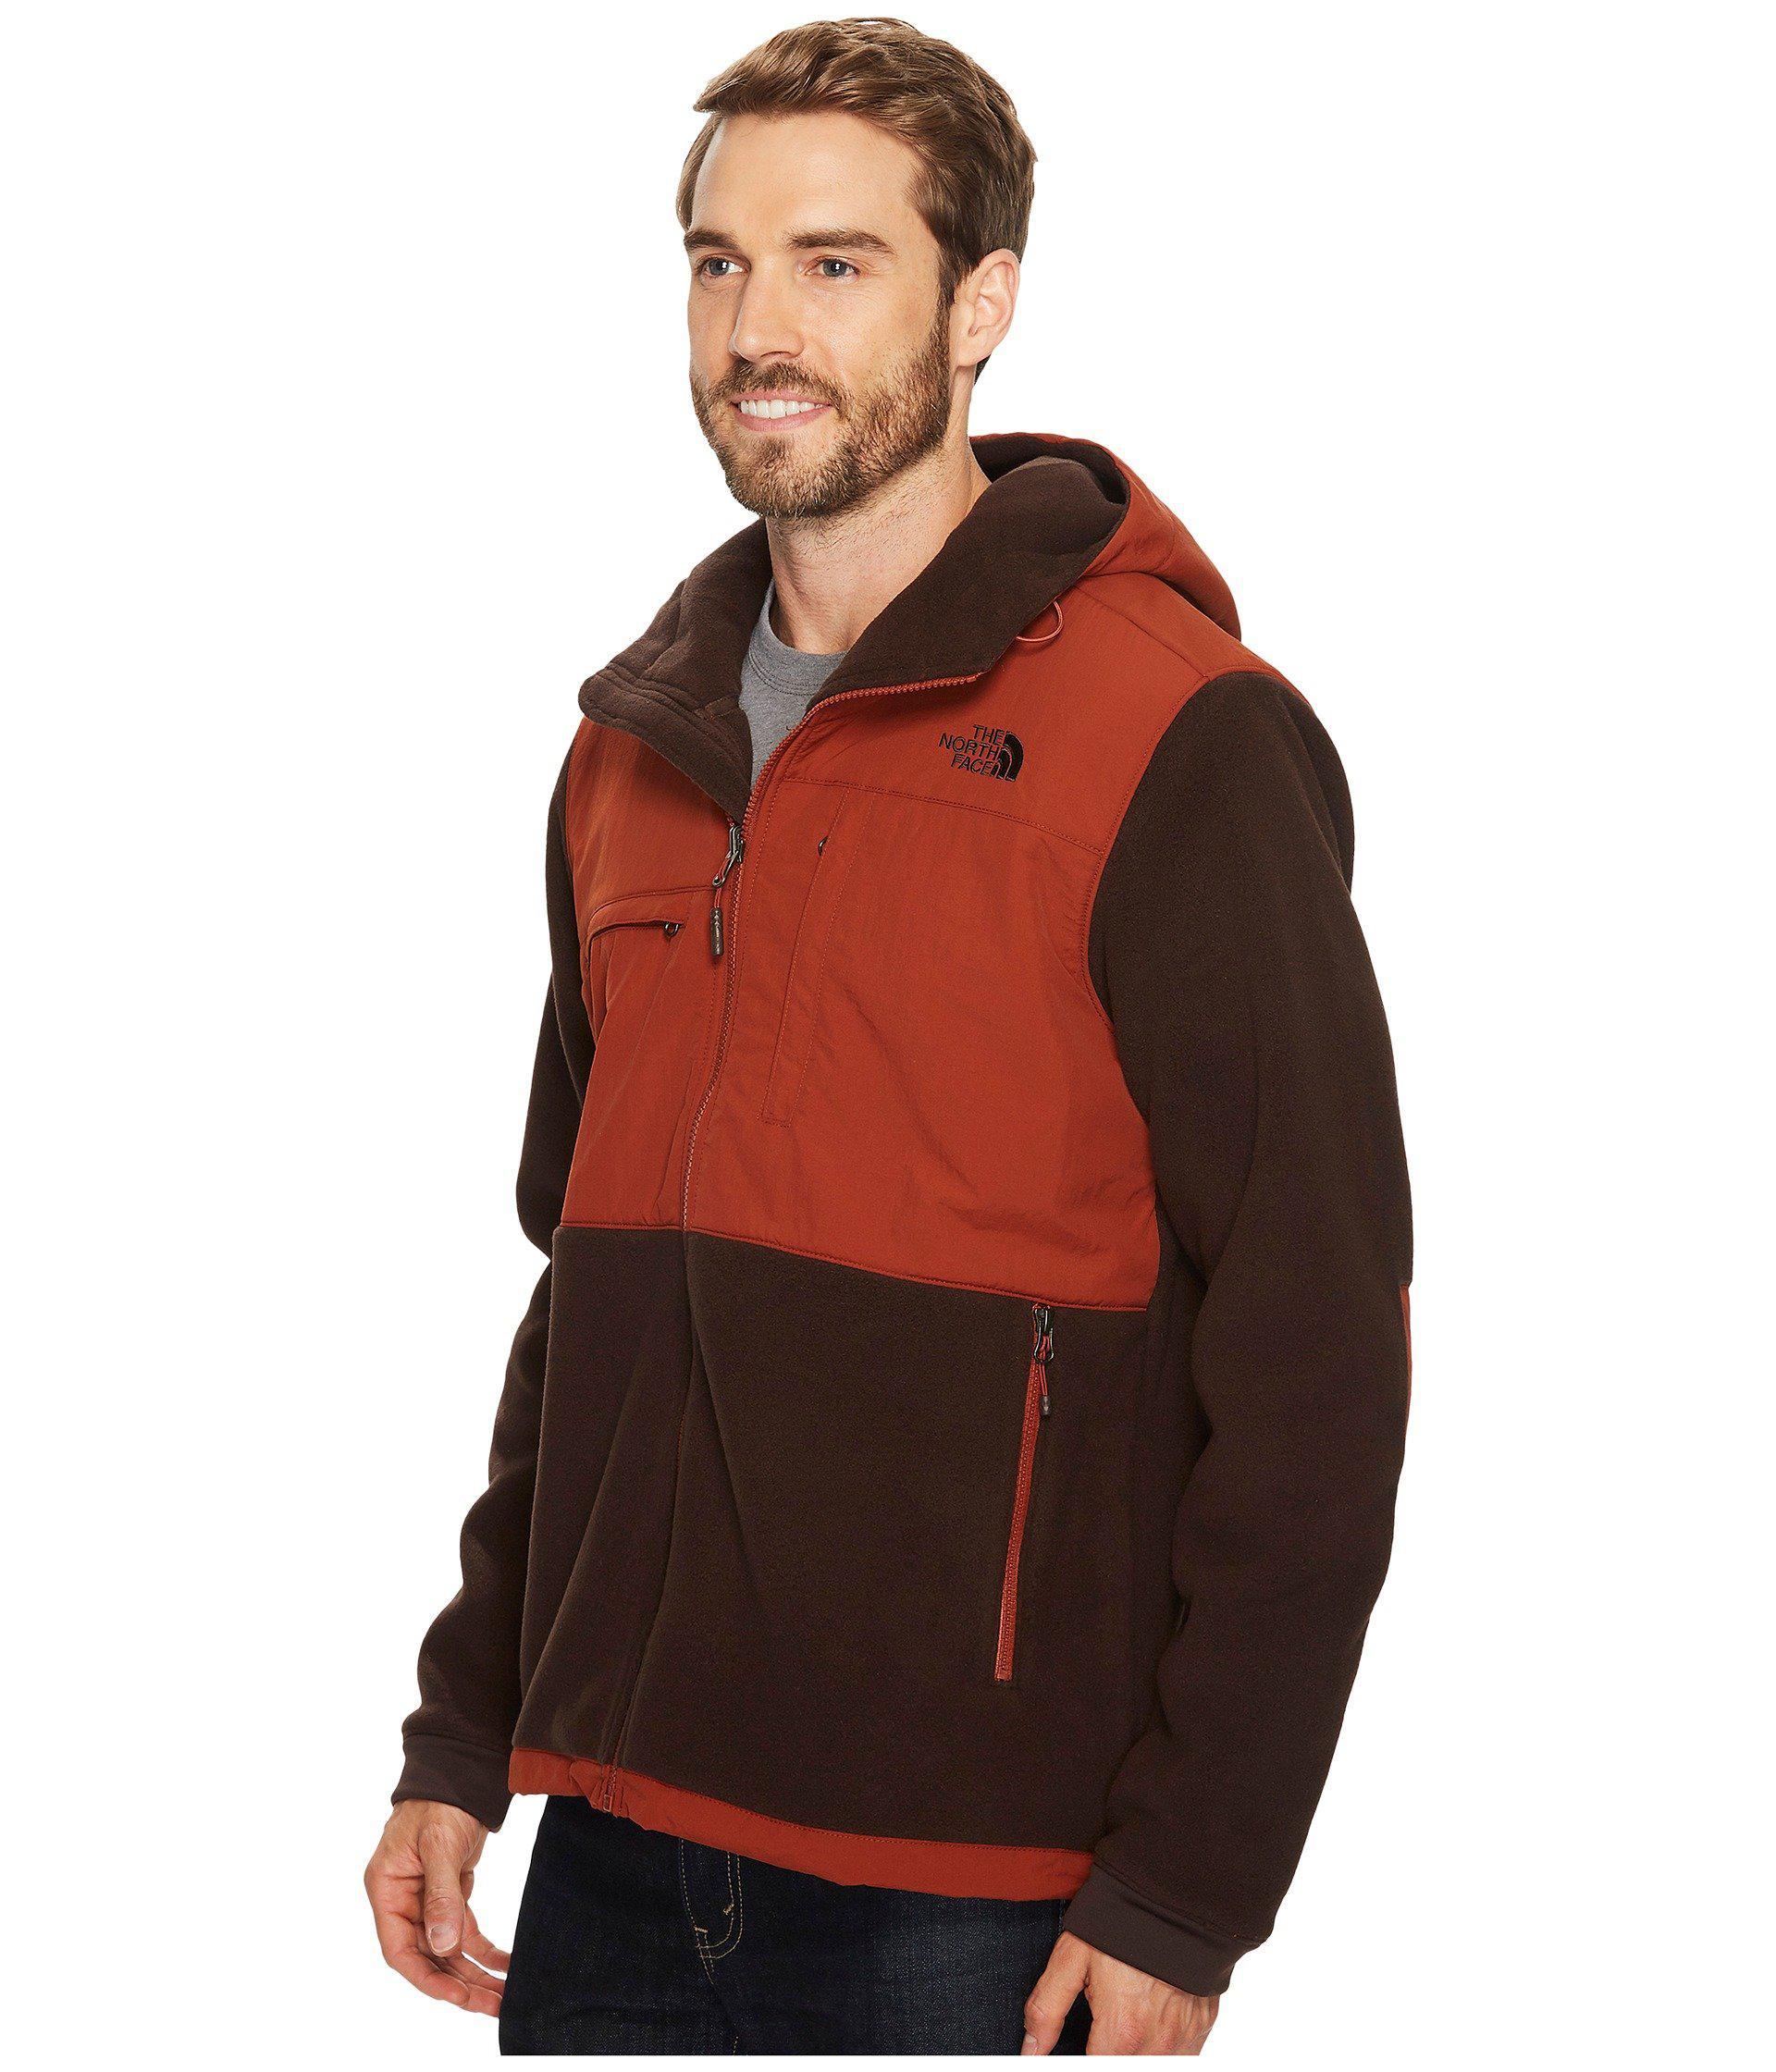 80b9752b4 Men's Brown S Denali 2 Jacket